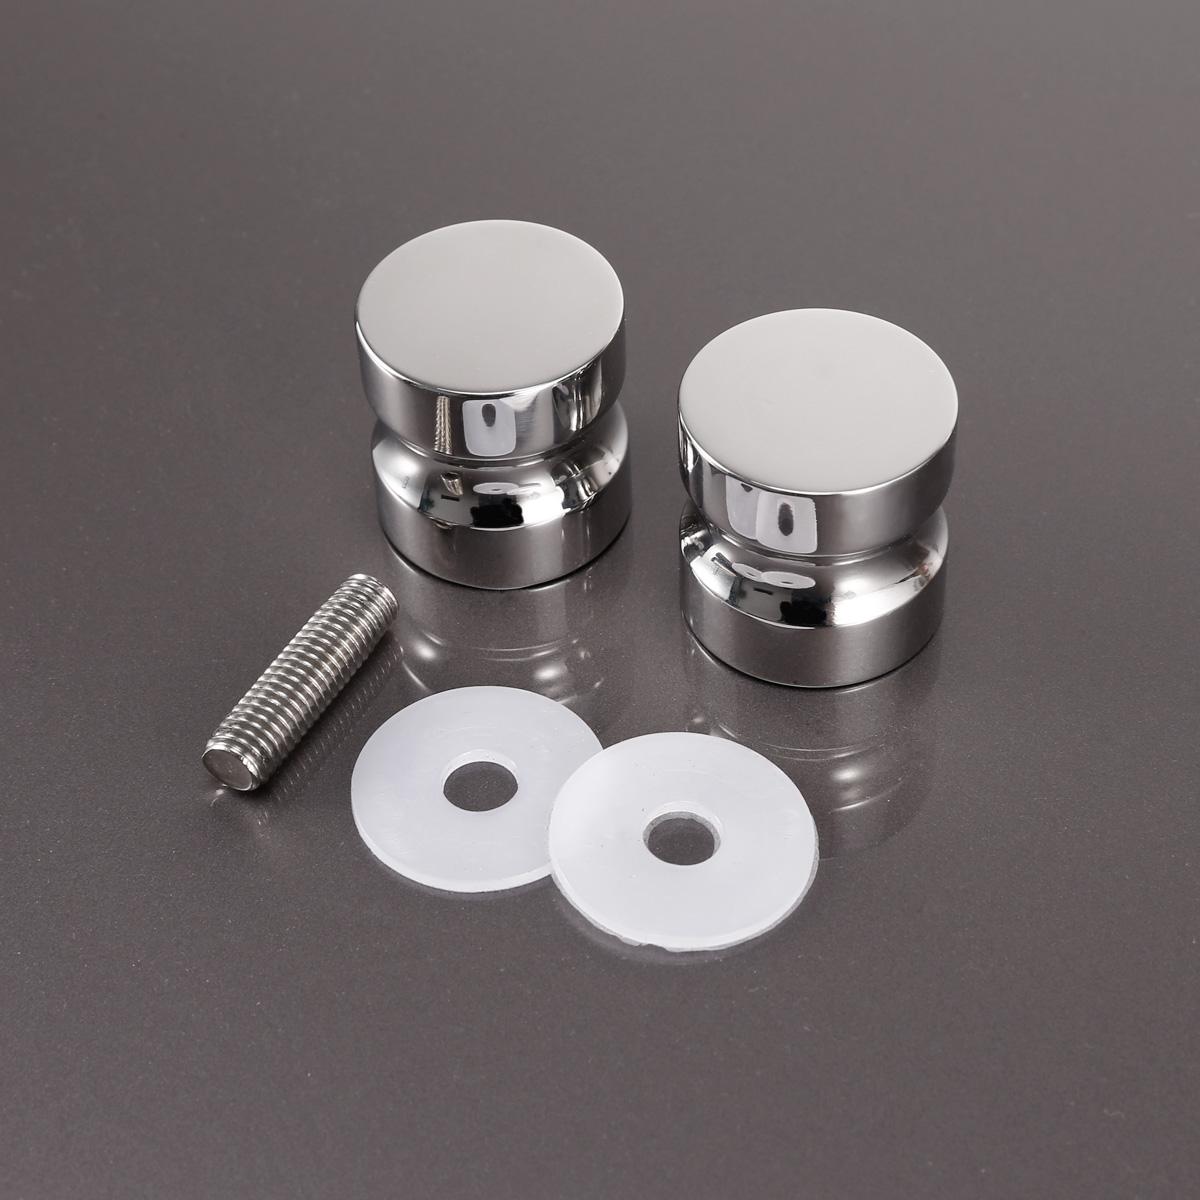 Glass bathroom knobs